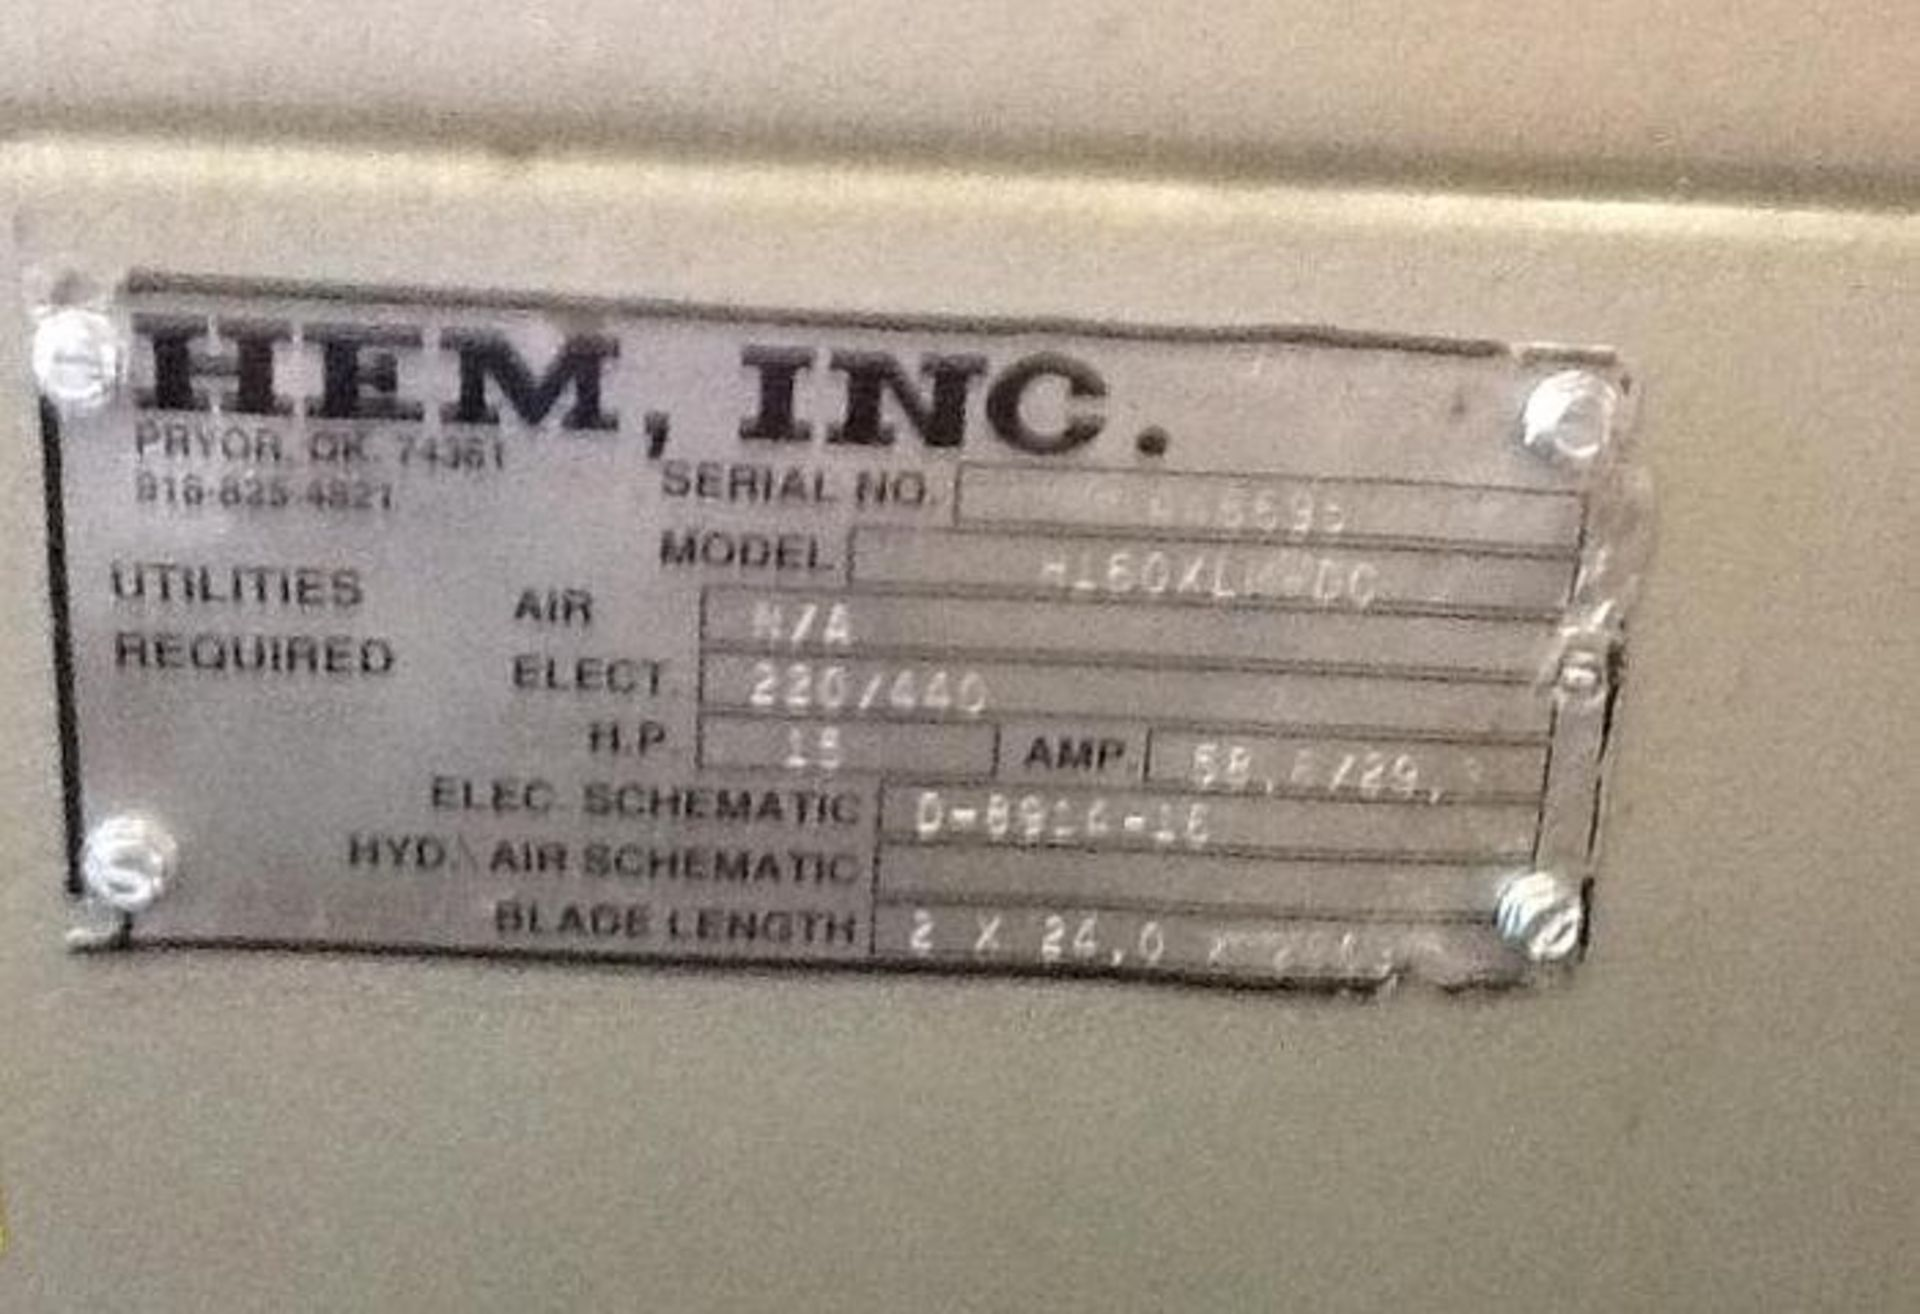 "HEM MODEL H160XLM-DC DOUBLE COLUMN HORIZONTAL BAND SAW, 25"" X 30"" CAPACITYSN 446695 - Image 7 of 7"